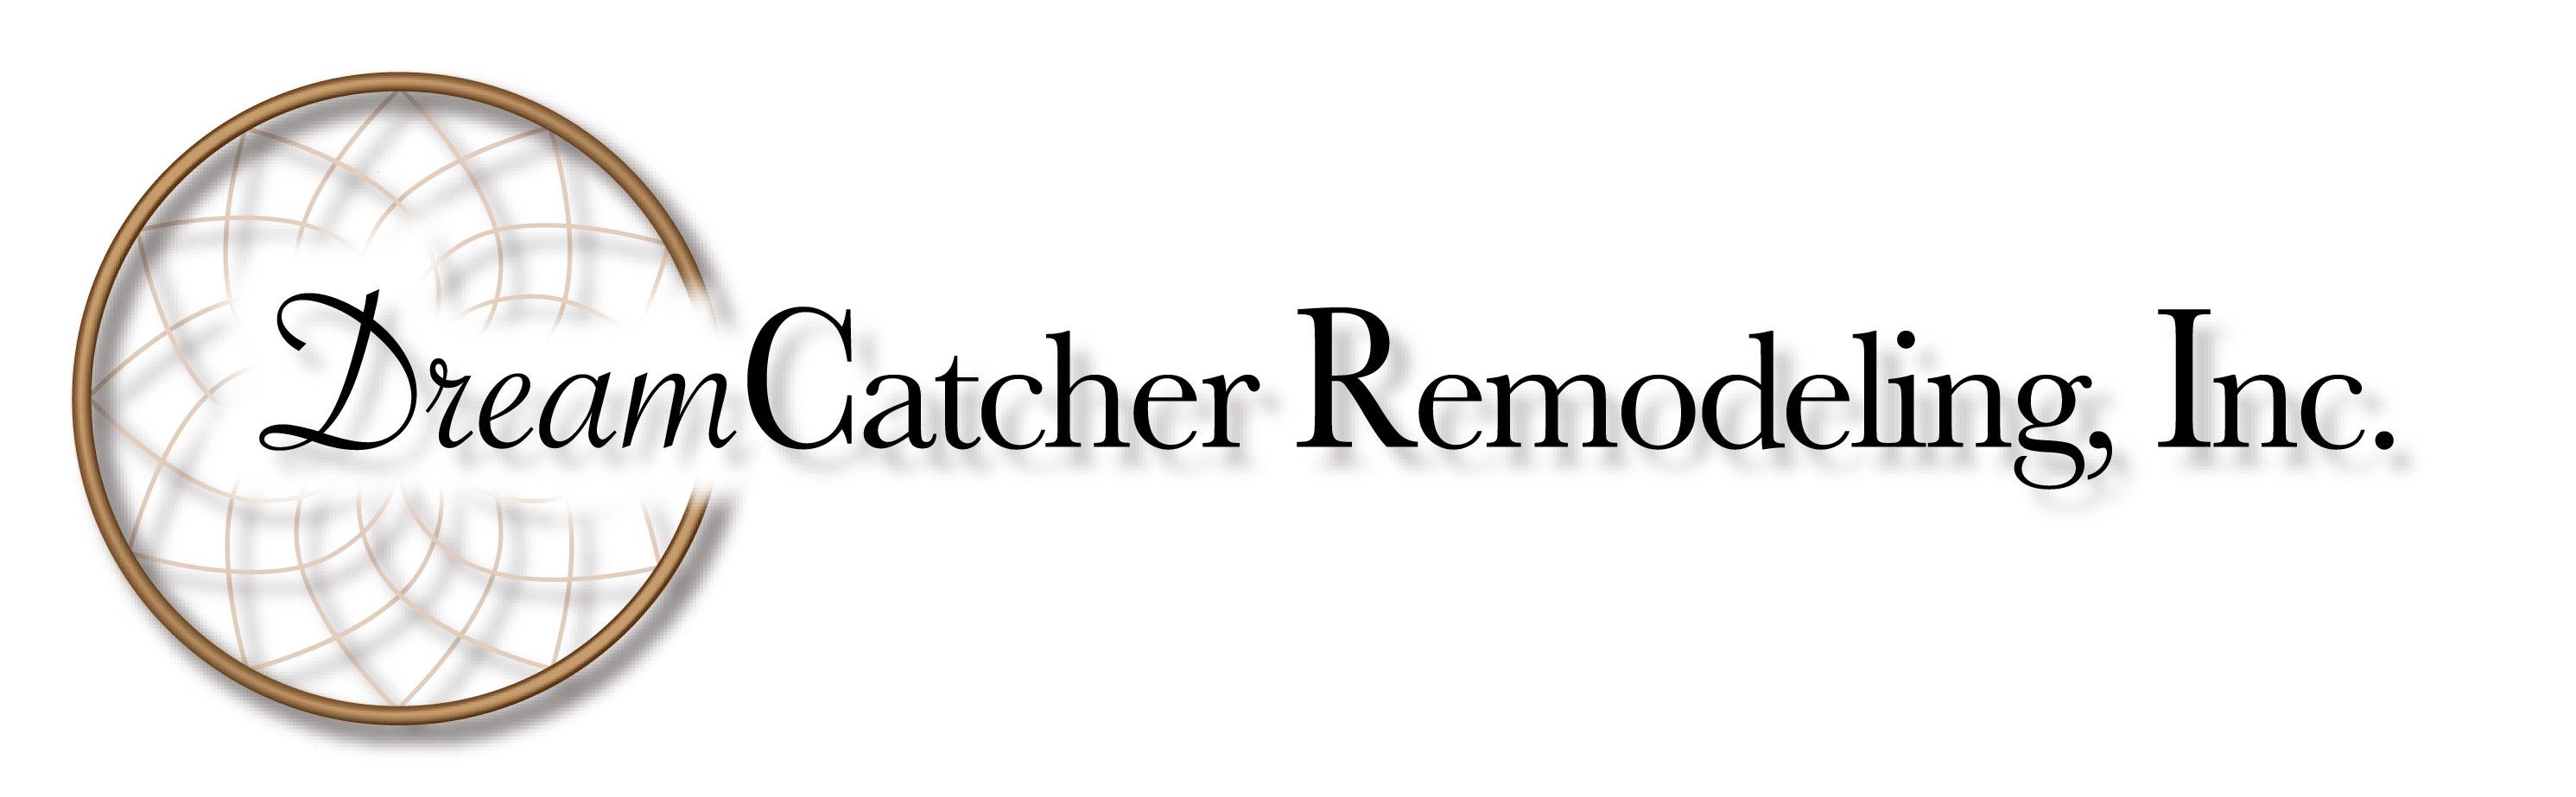 DreamCatcher Remodeling, Inc. image 0